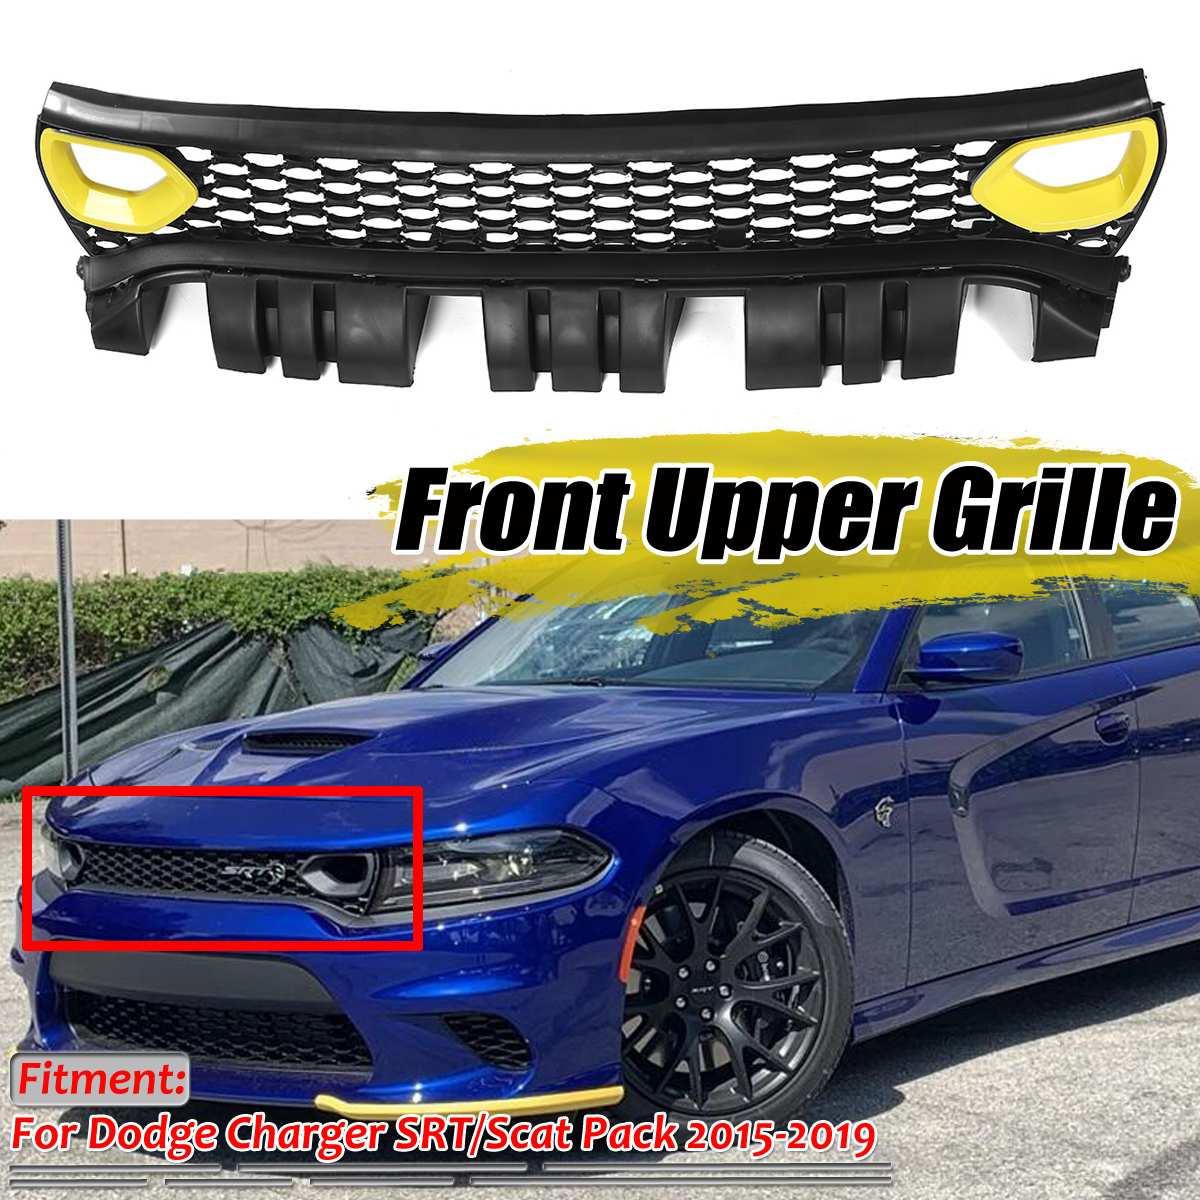 SRT/Scat Pack Style Car Front Bumper Mesh Grille Upper Grill Grille For Dodge For Charger SRT/Scat 2015-2019 In Racing Grills